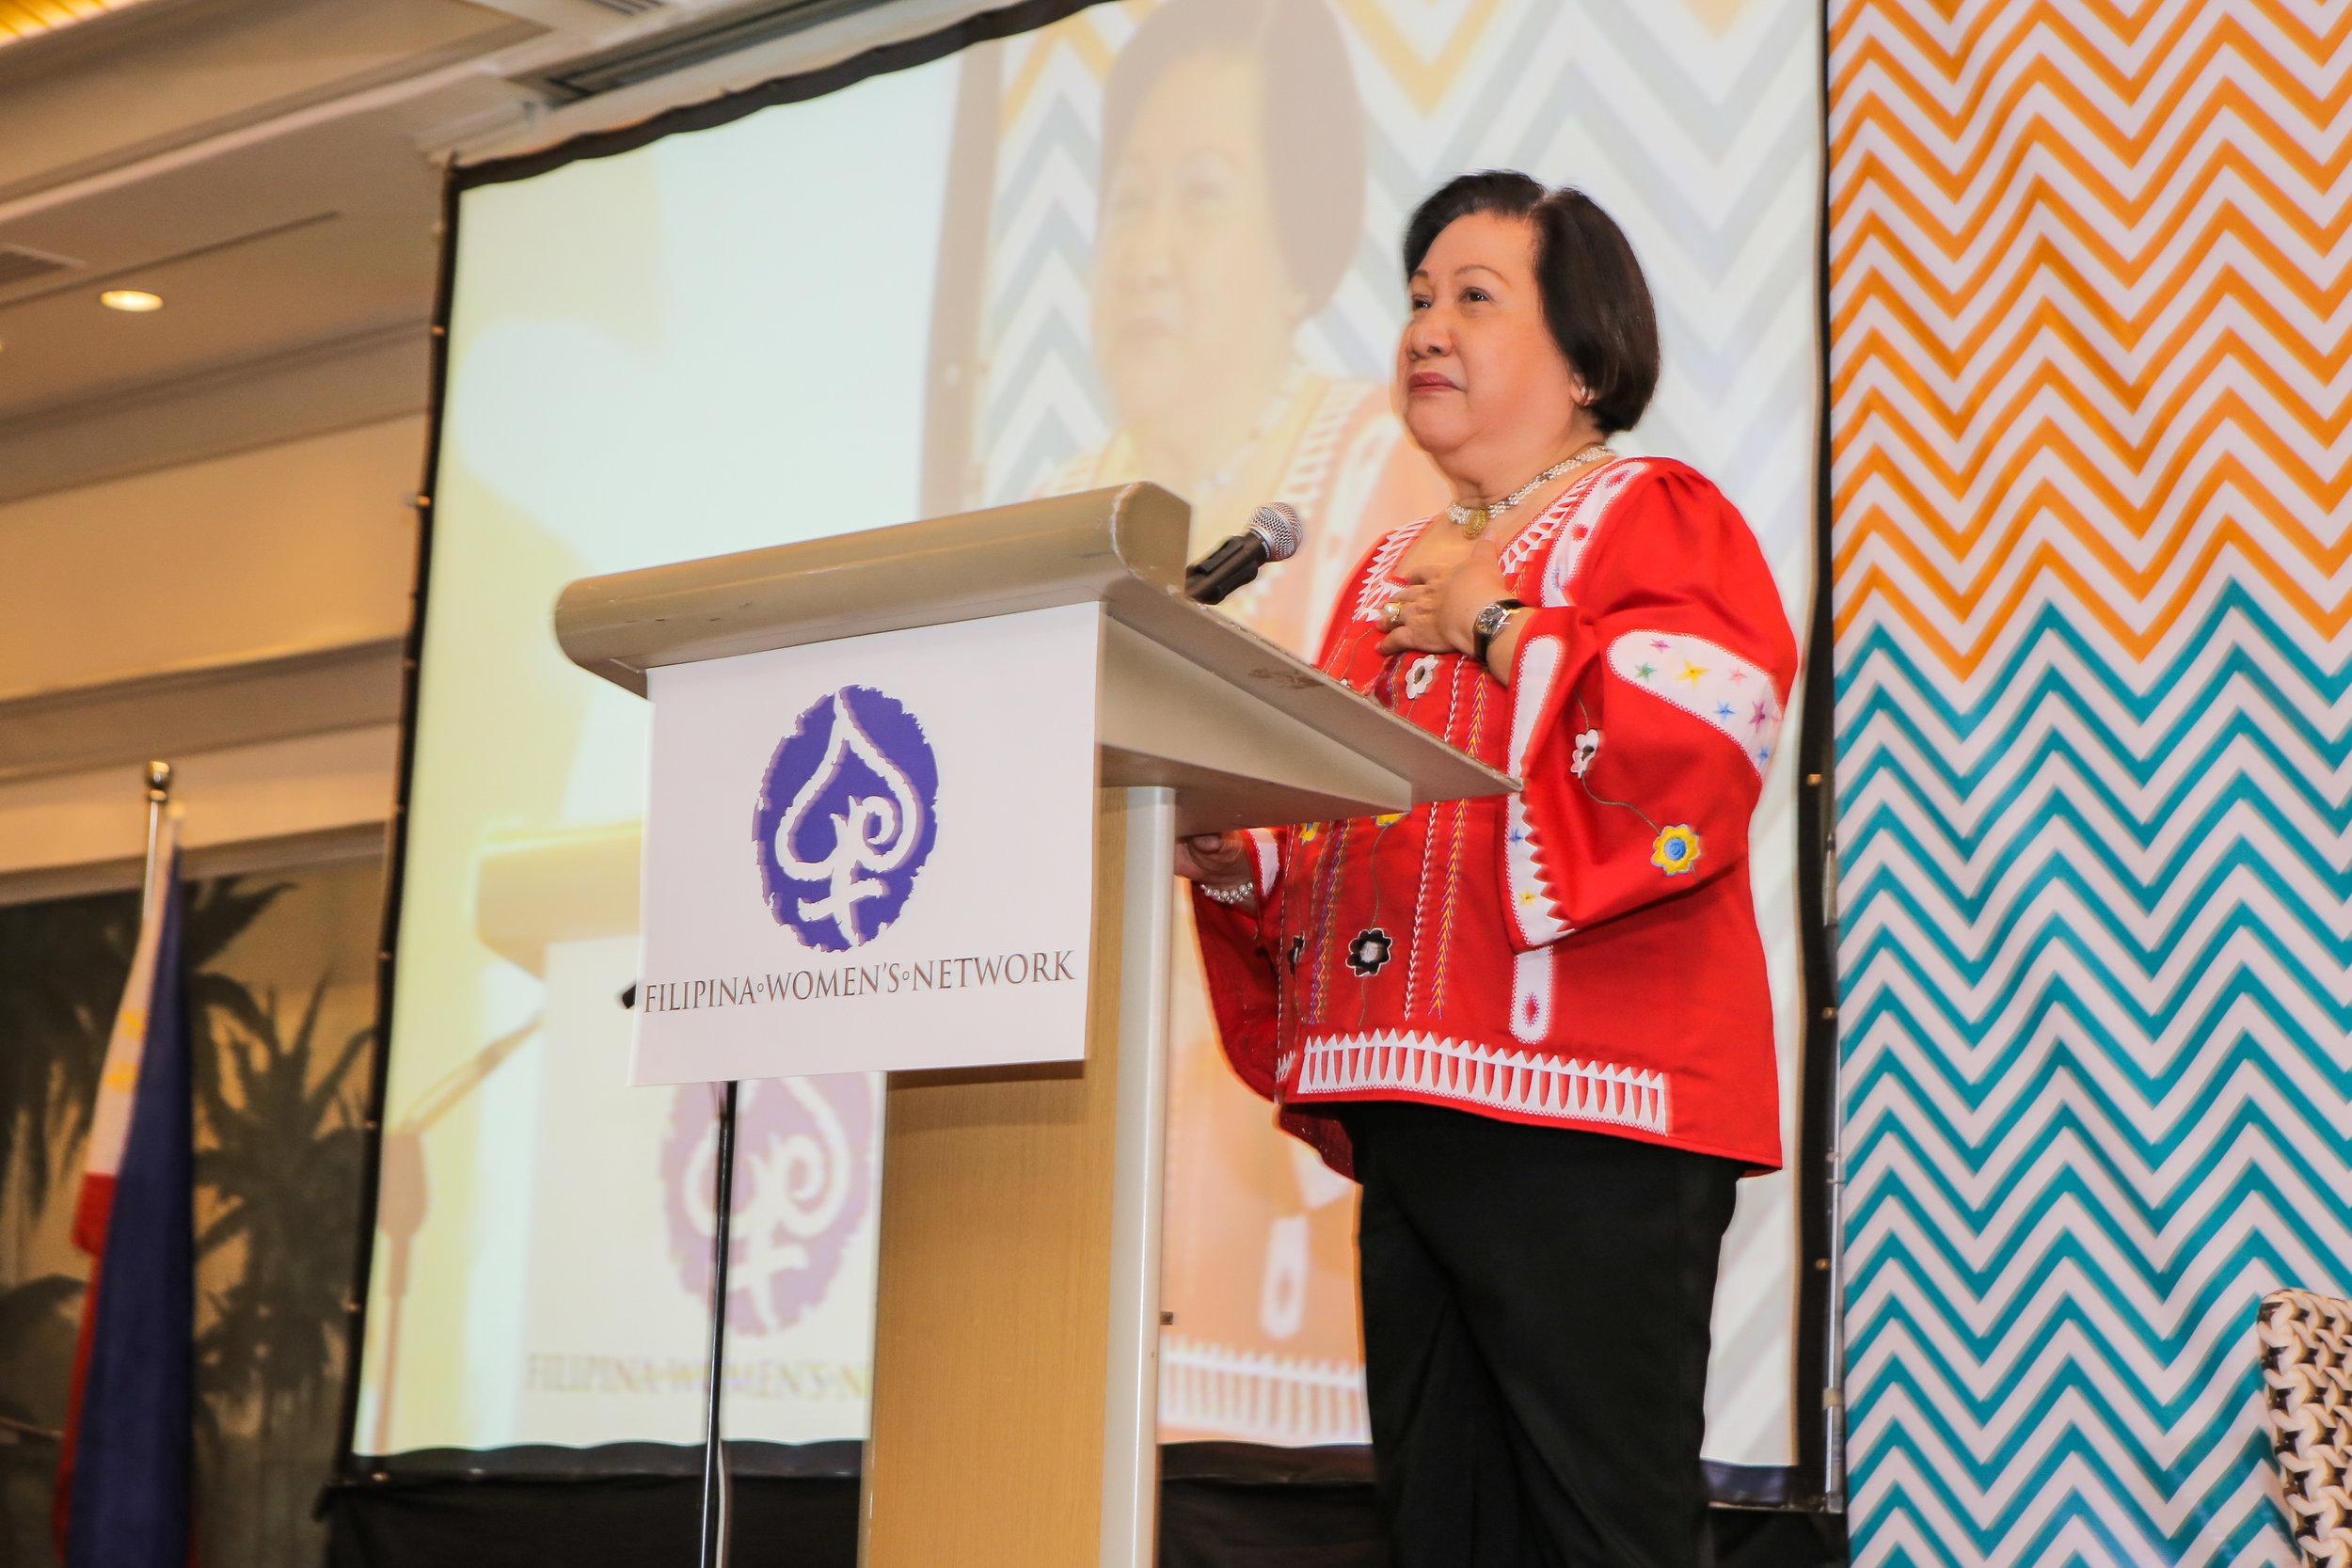 Former Governor of Antique Sally Zaldivar Perez representing Senator Loren Legarda at the #FWNSummit2016 in Cebu on August 24, 2016.